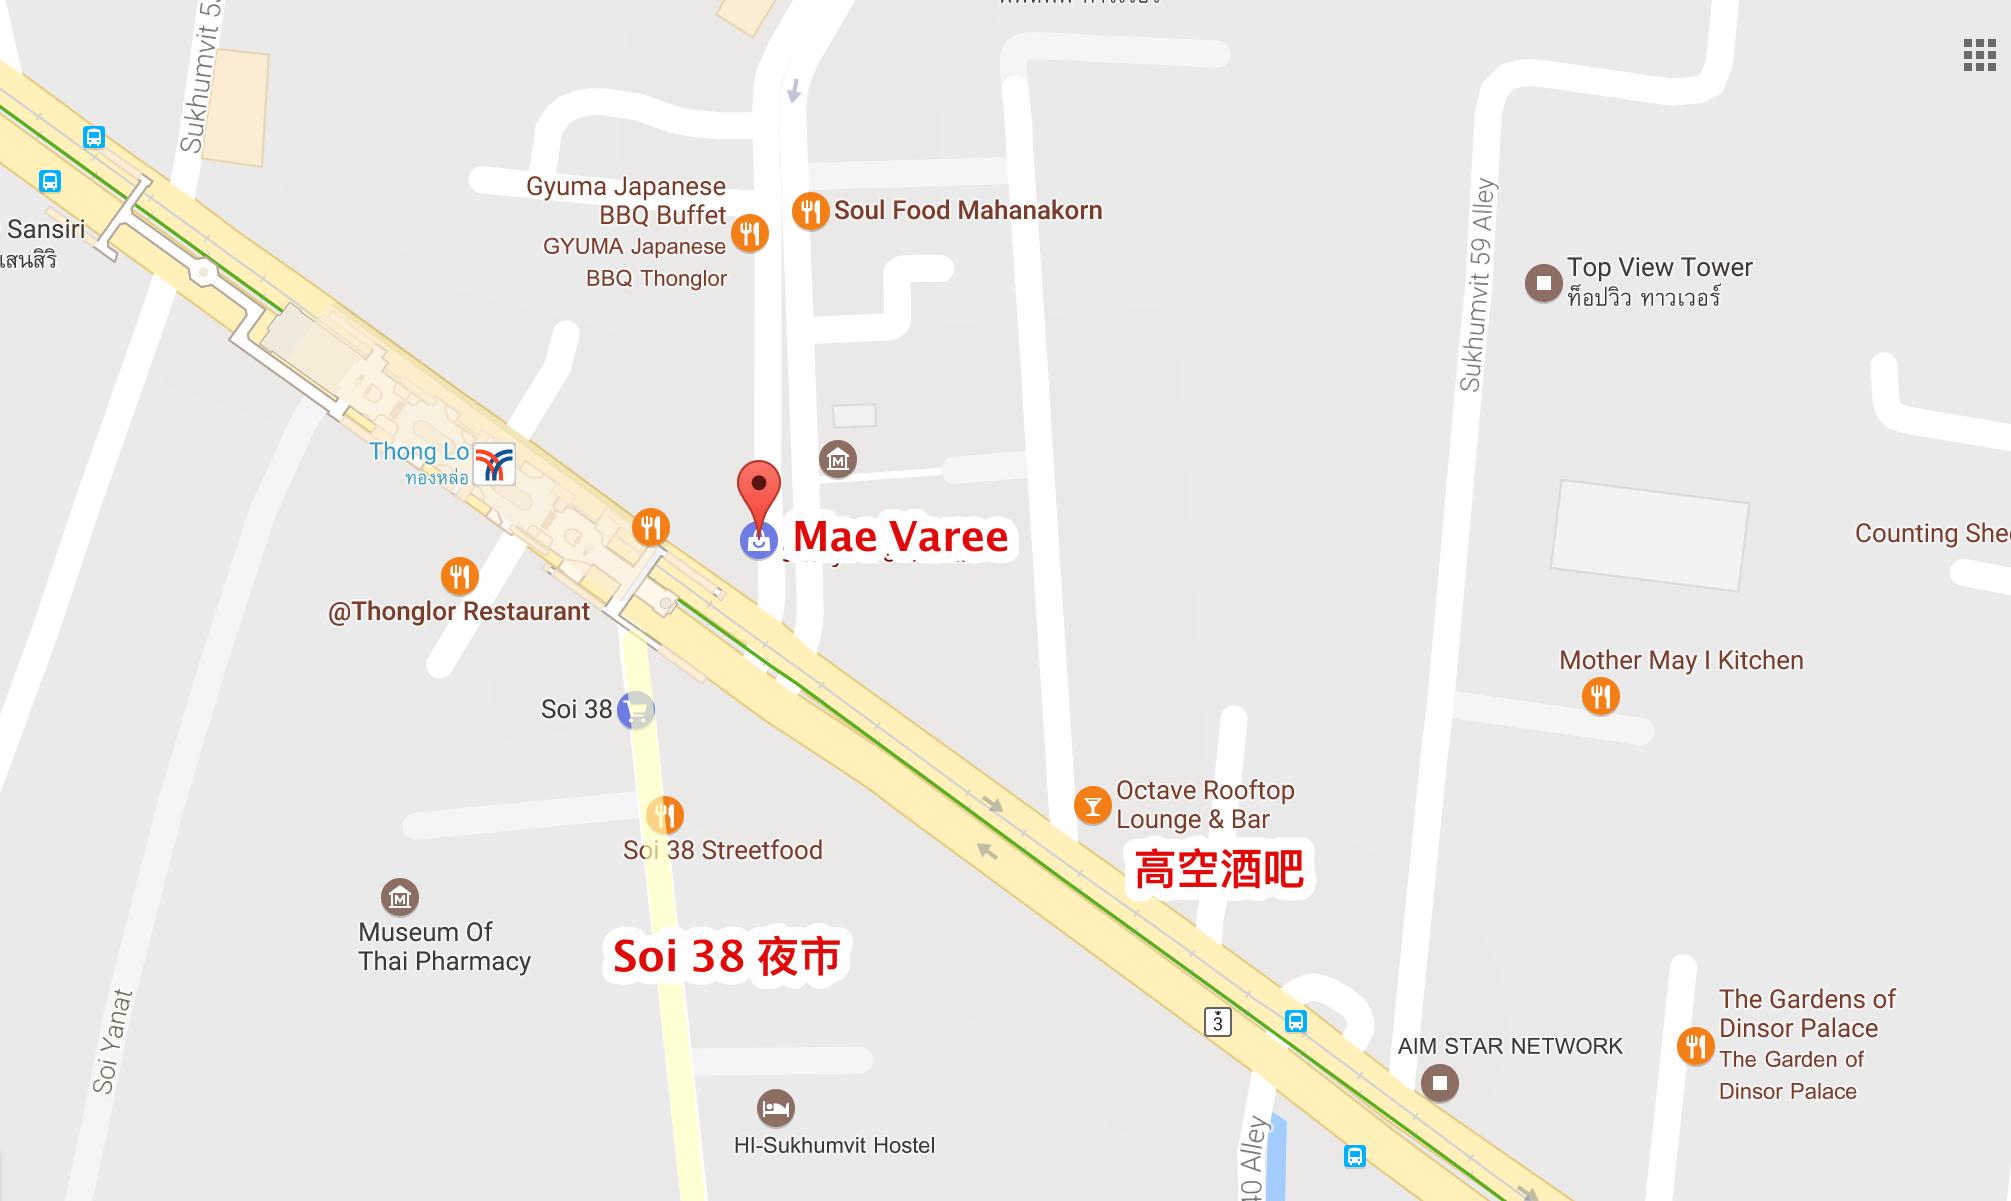 曼谷美食 Mae Varee 超好吃芒果糯米飯 Thong Lor區道地美食